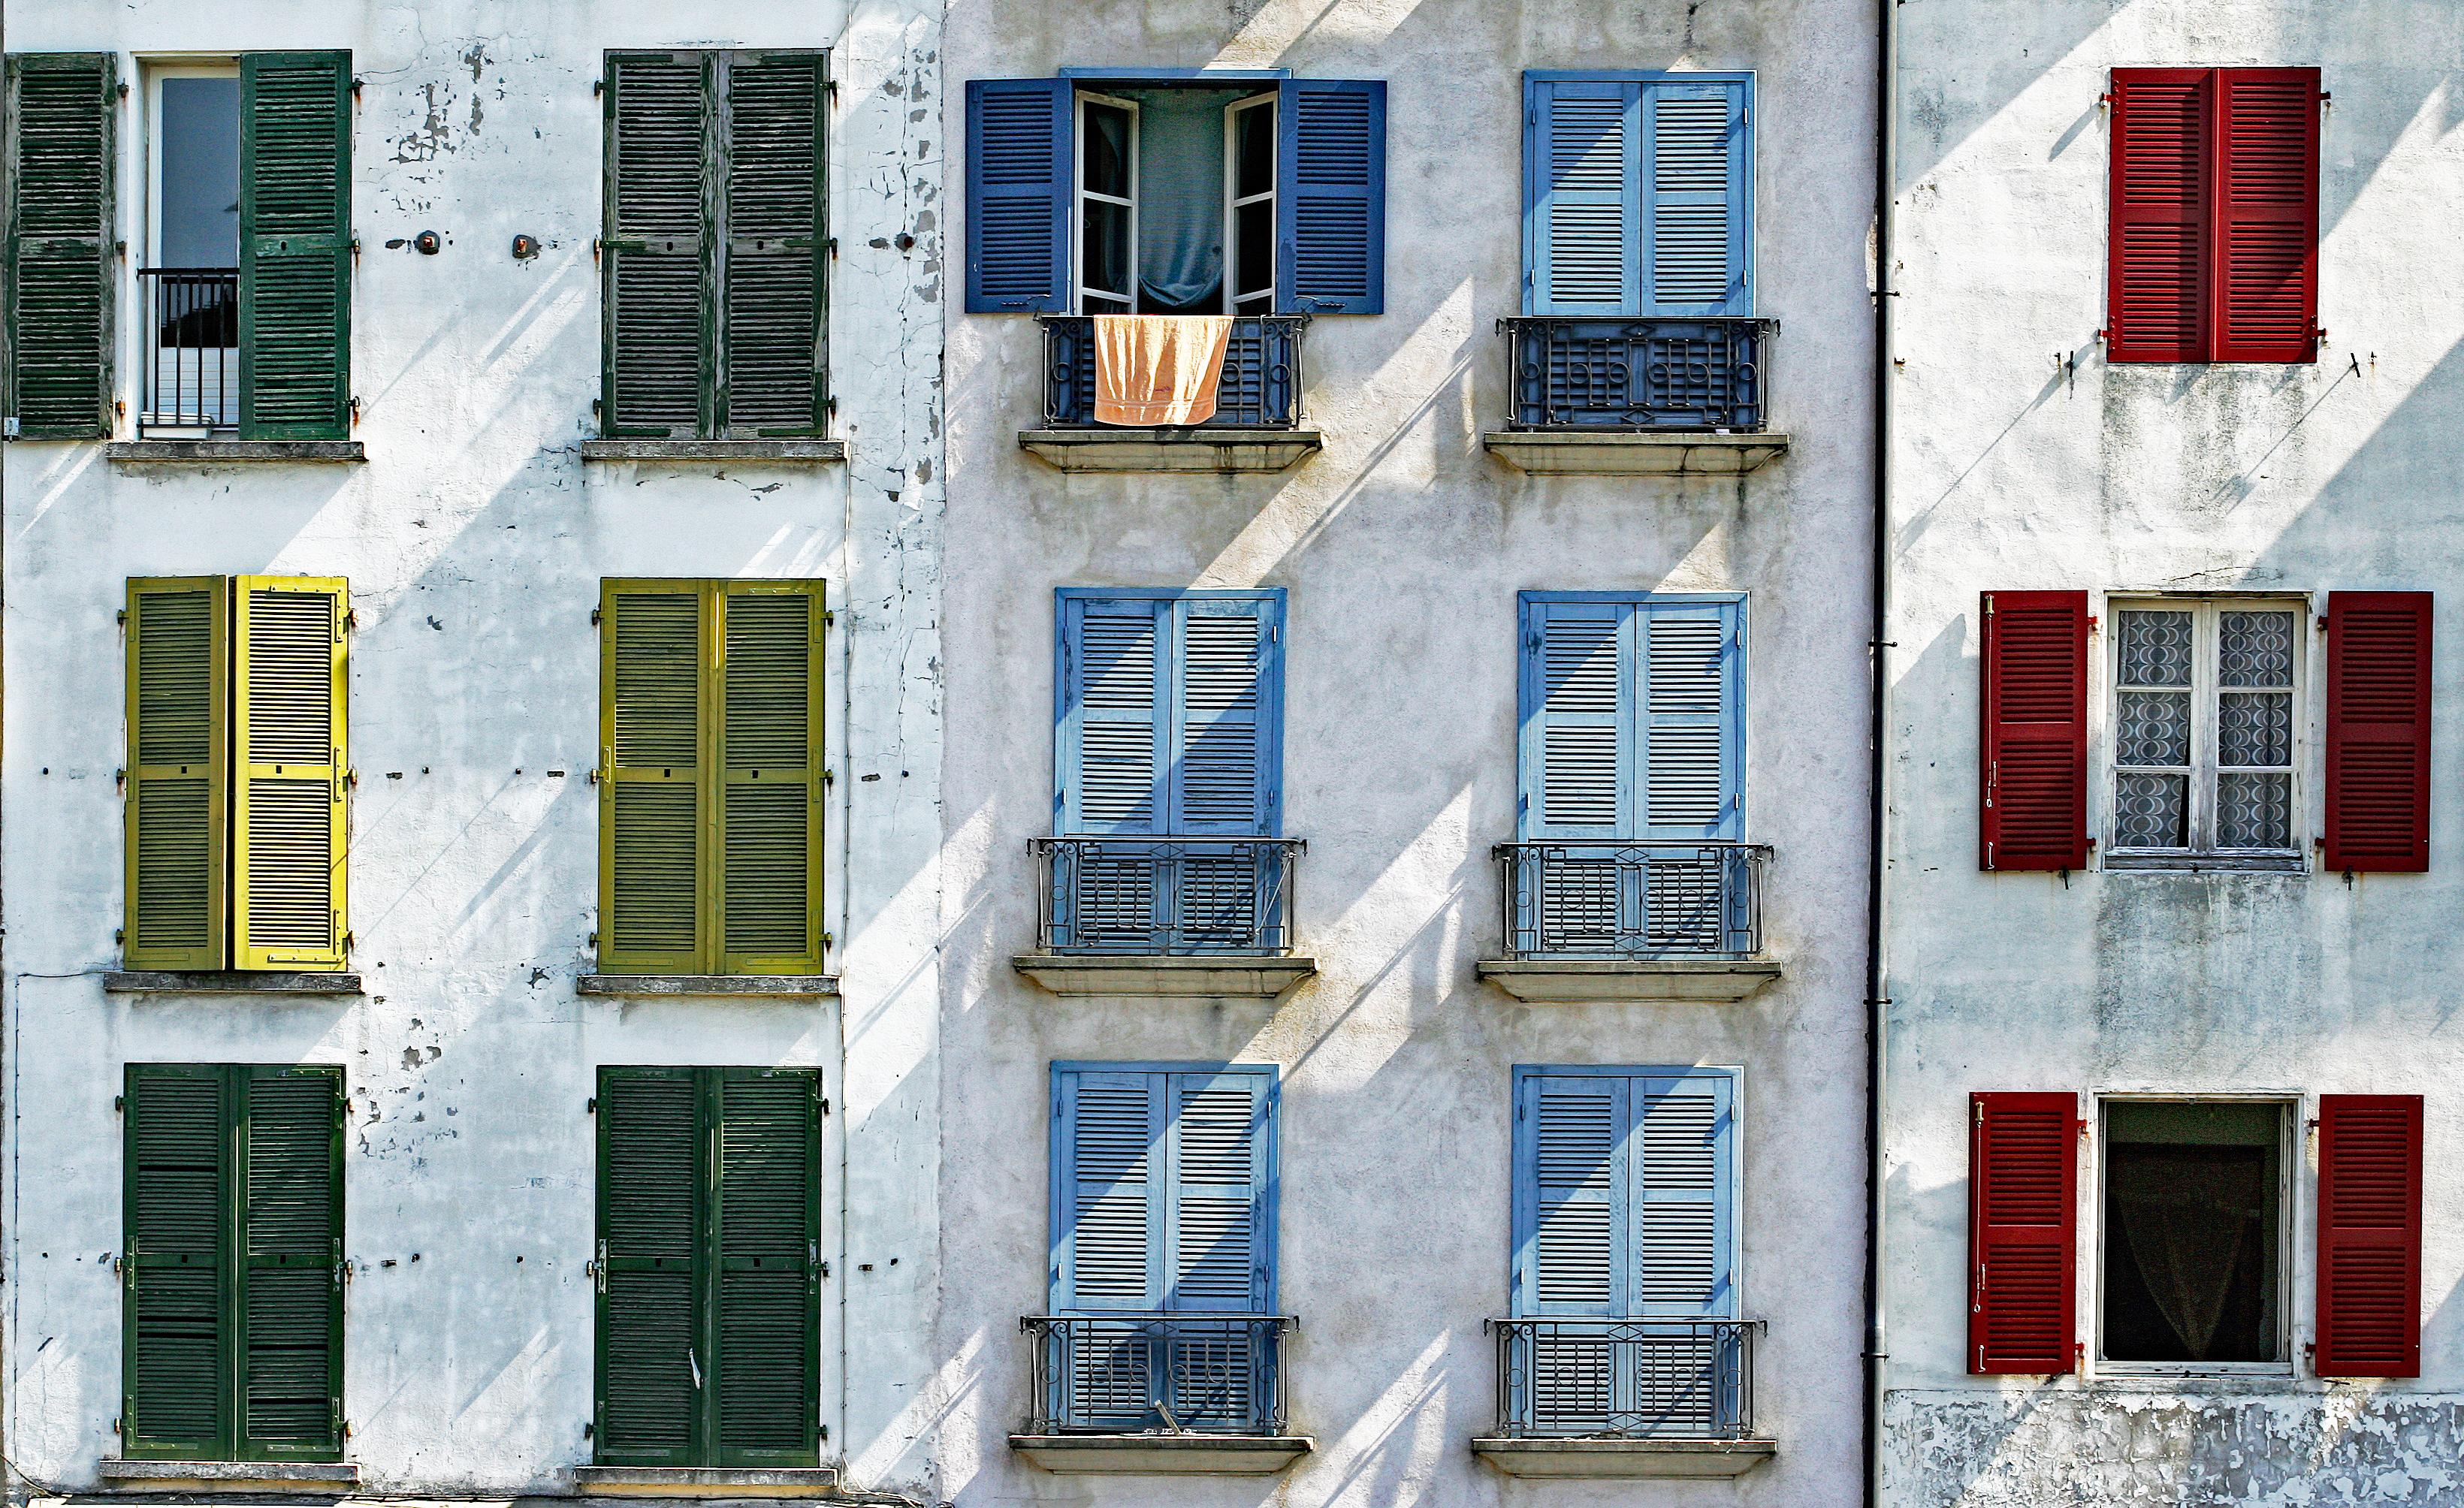 Window City Architecture Building Wall House Canon Door France Windows  Francia Apartment Frankreich Facade Fenetre Euskalherria